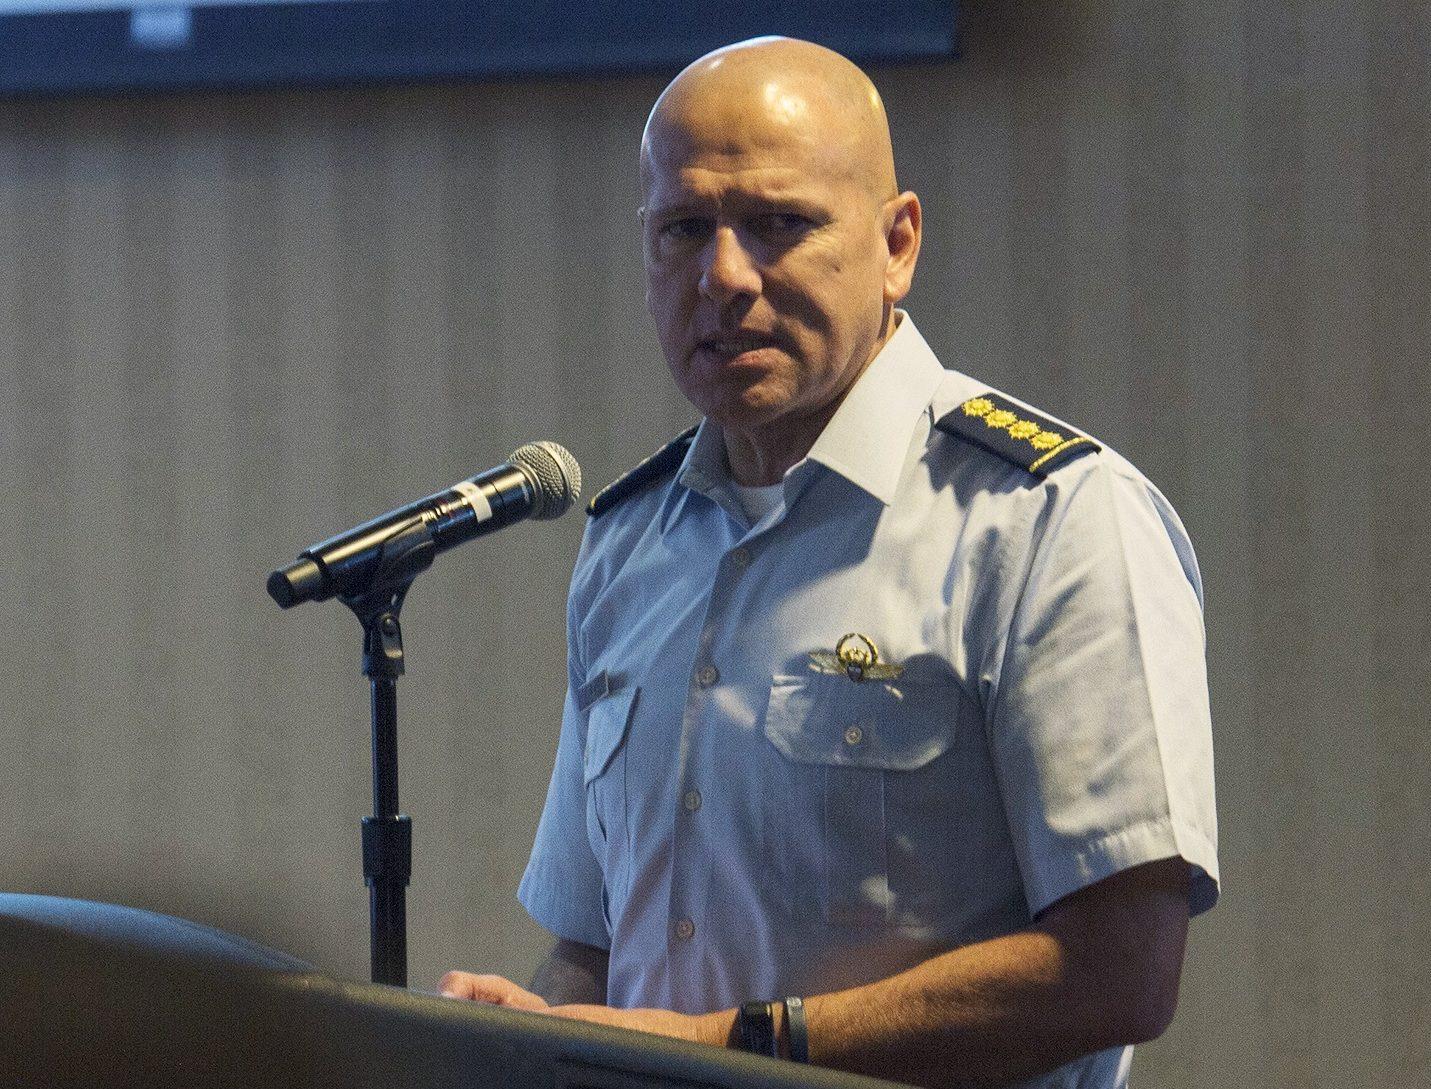 Fuerza Aérea Colombiana busca ser referente tras ejercer un liderazgo